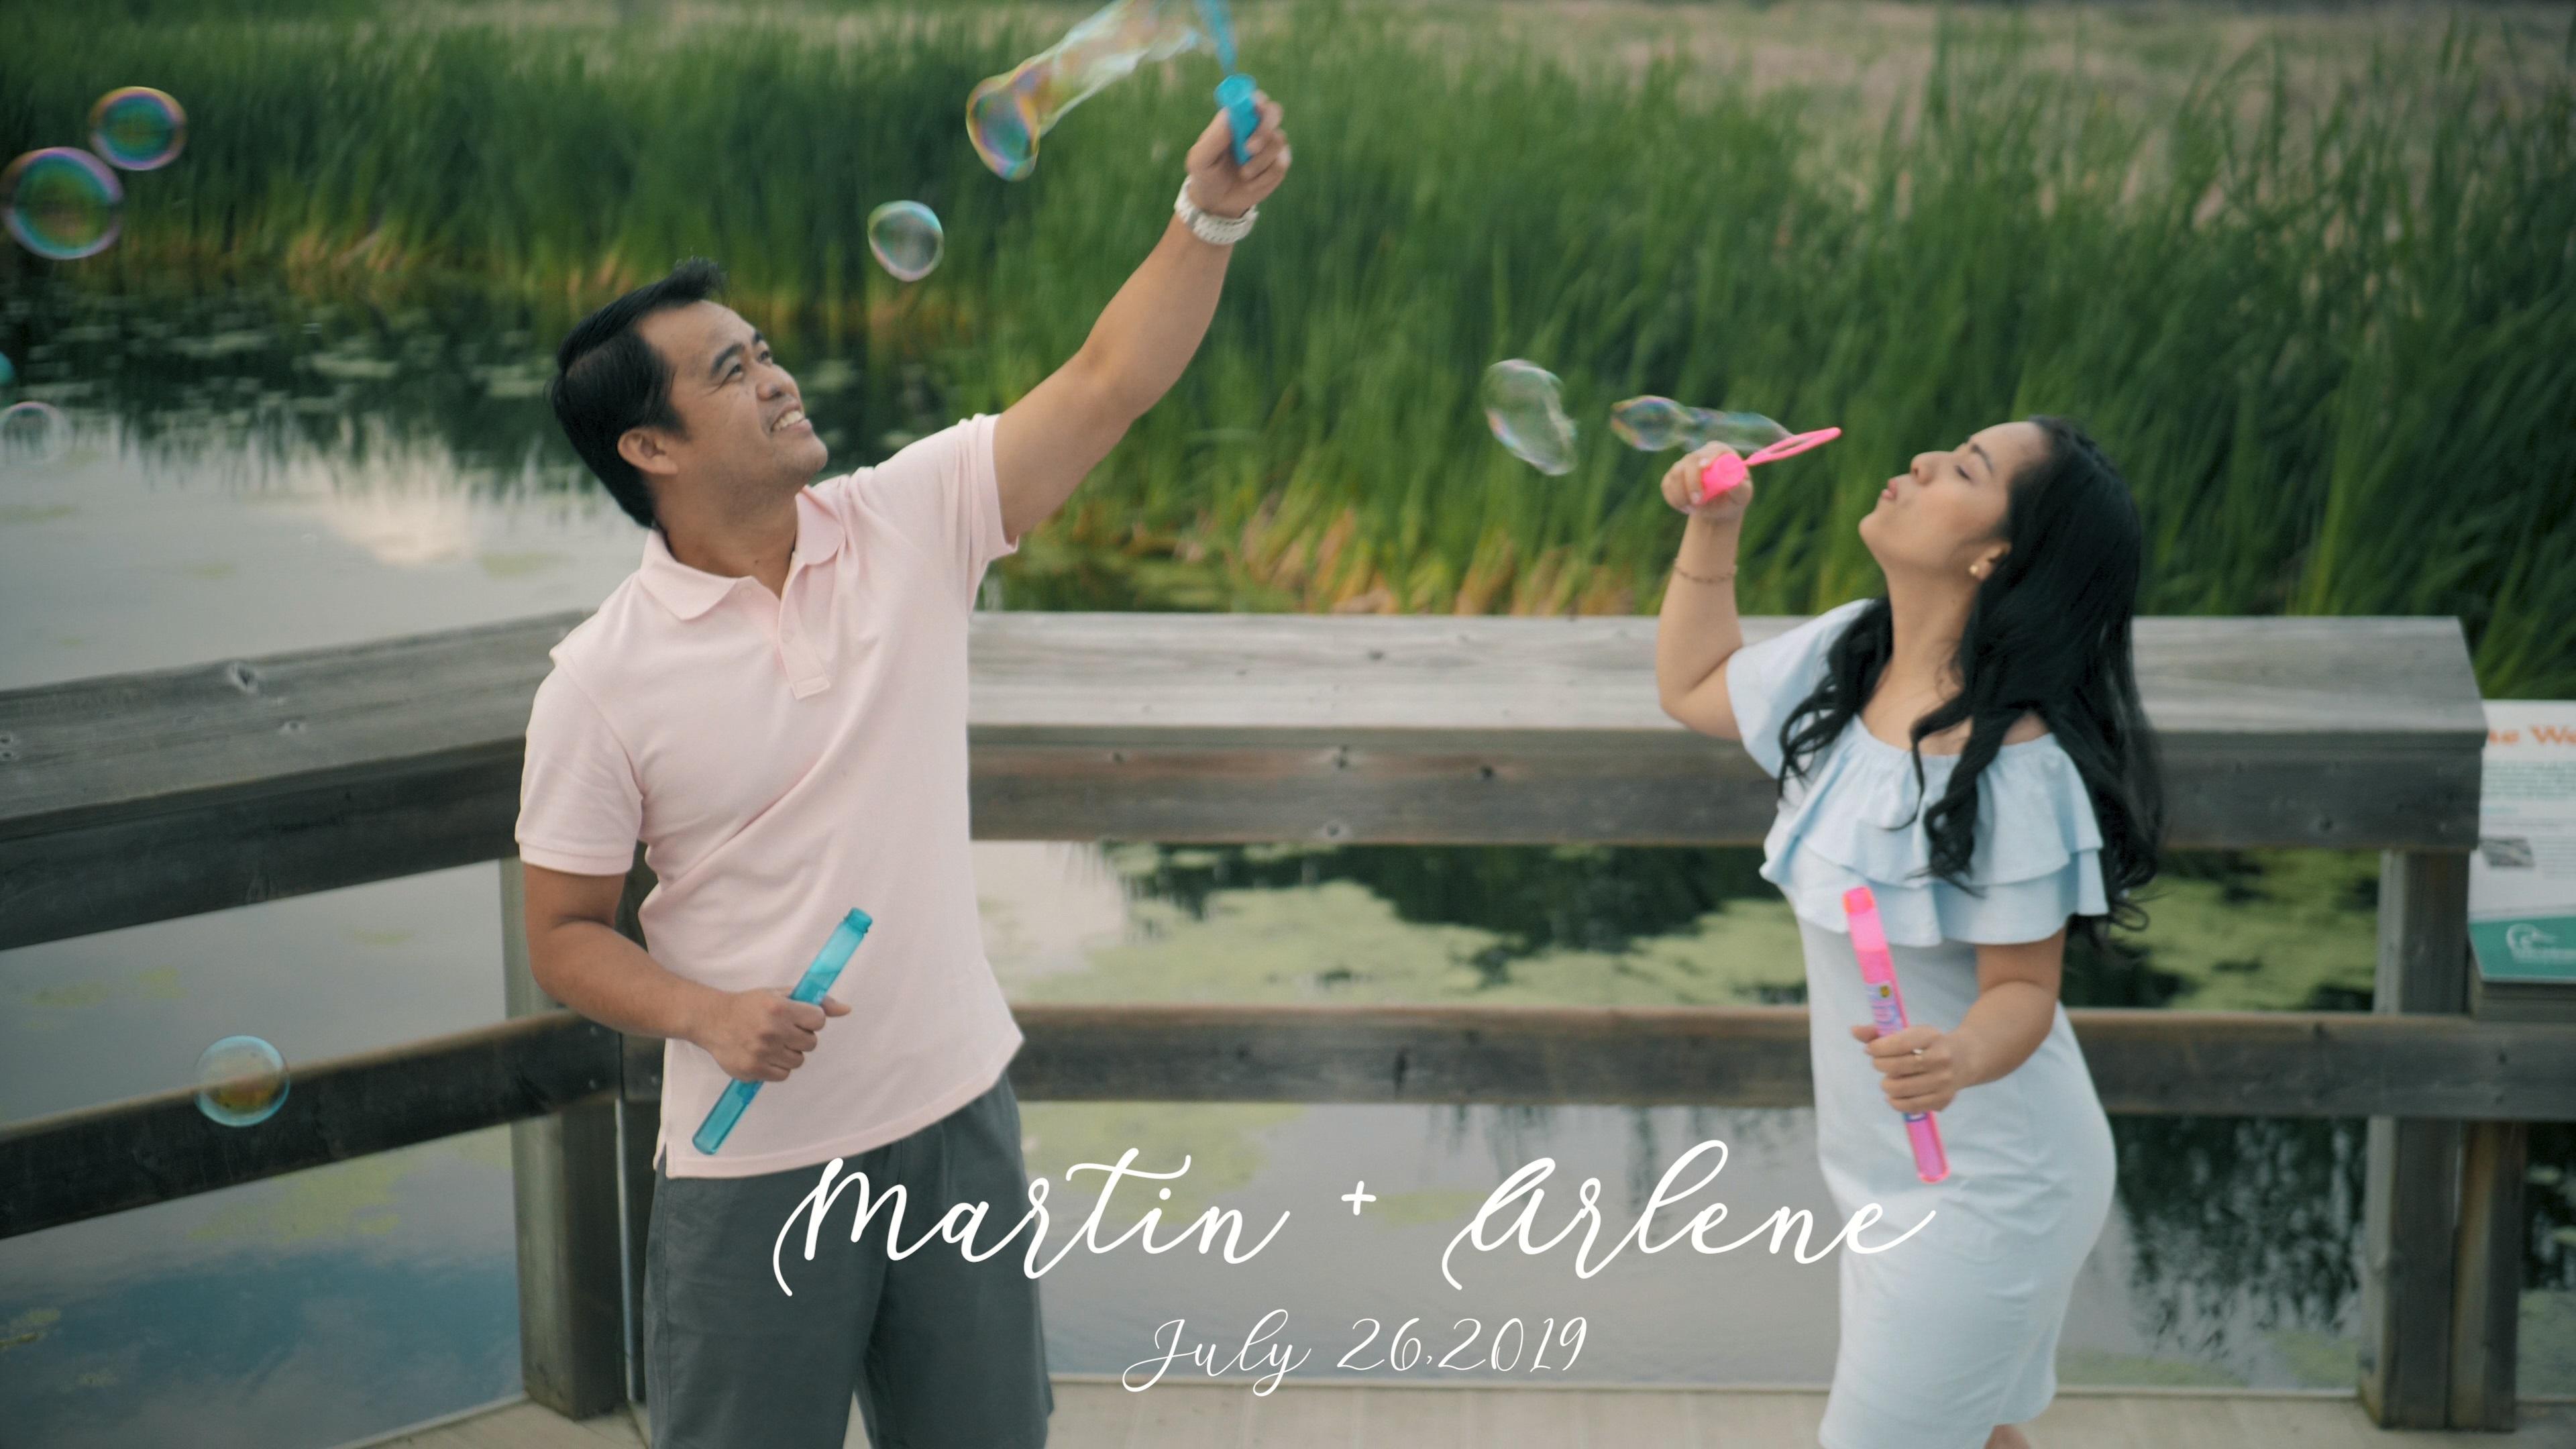 Martin + Arlene | Edmonton, Canada | Event Hall